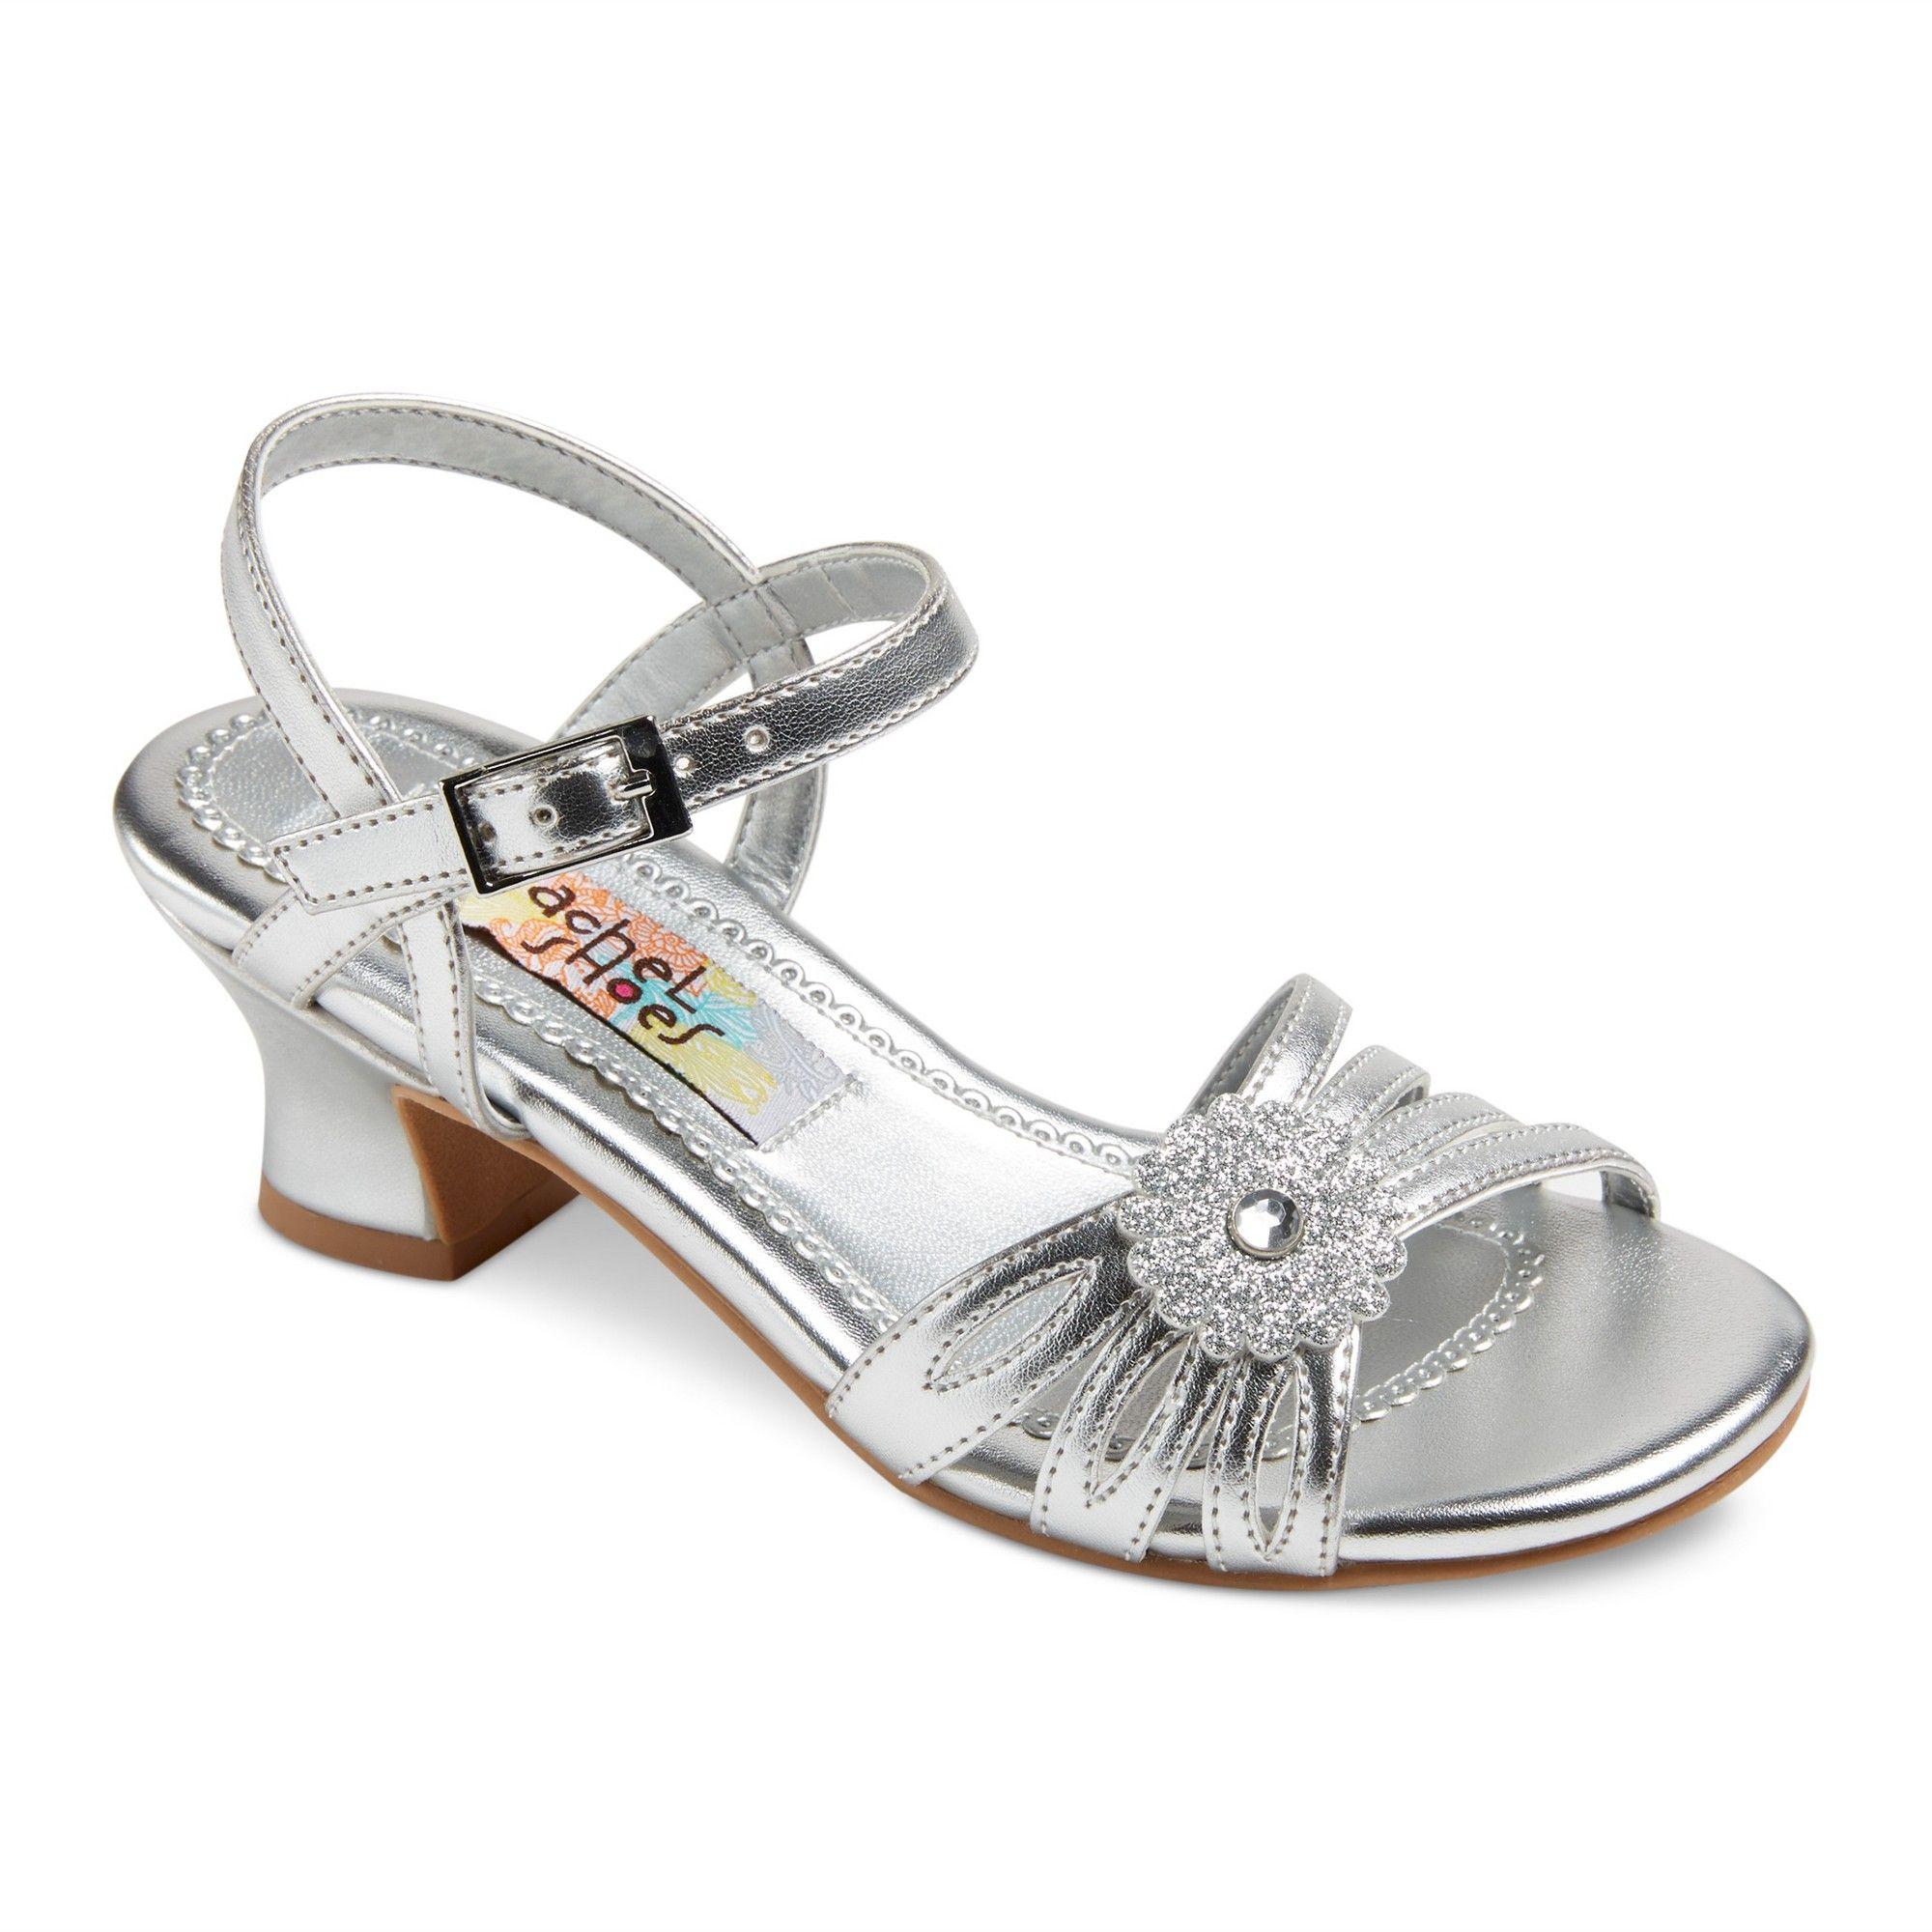 dc5a841818 Girls' Corrine Quarter Strap Gladiator Sandals Silver Metallic 13 - Rachel  Shoes